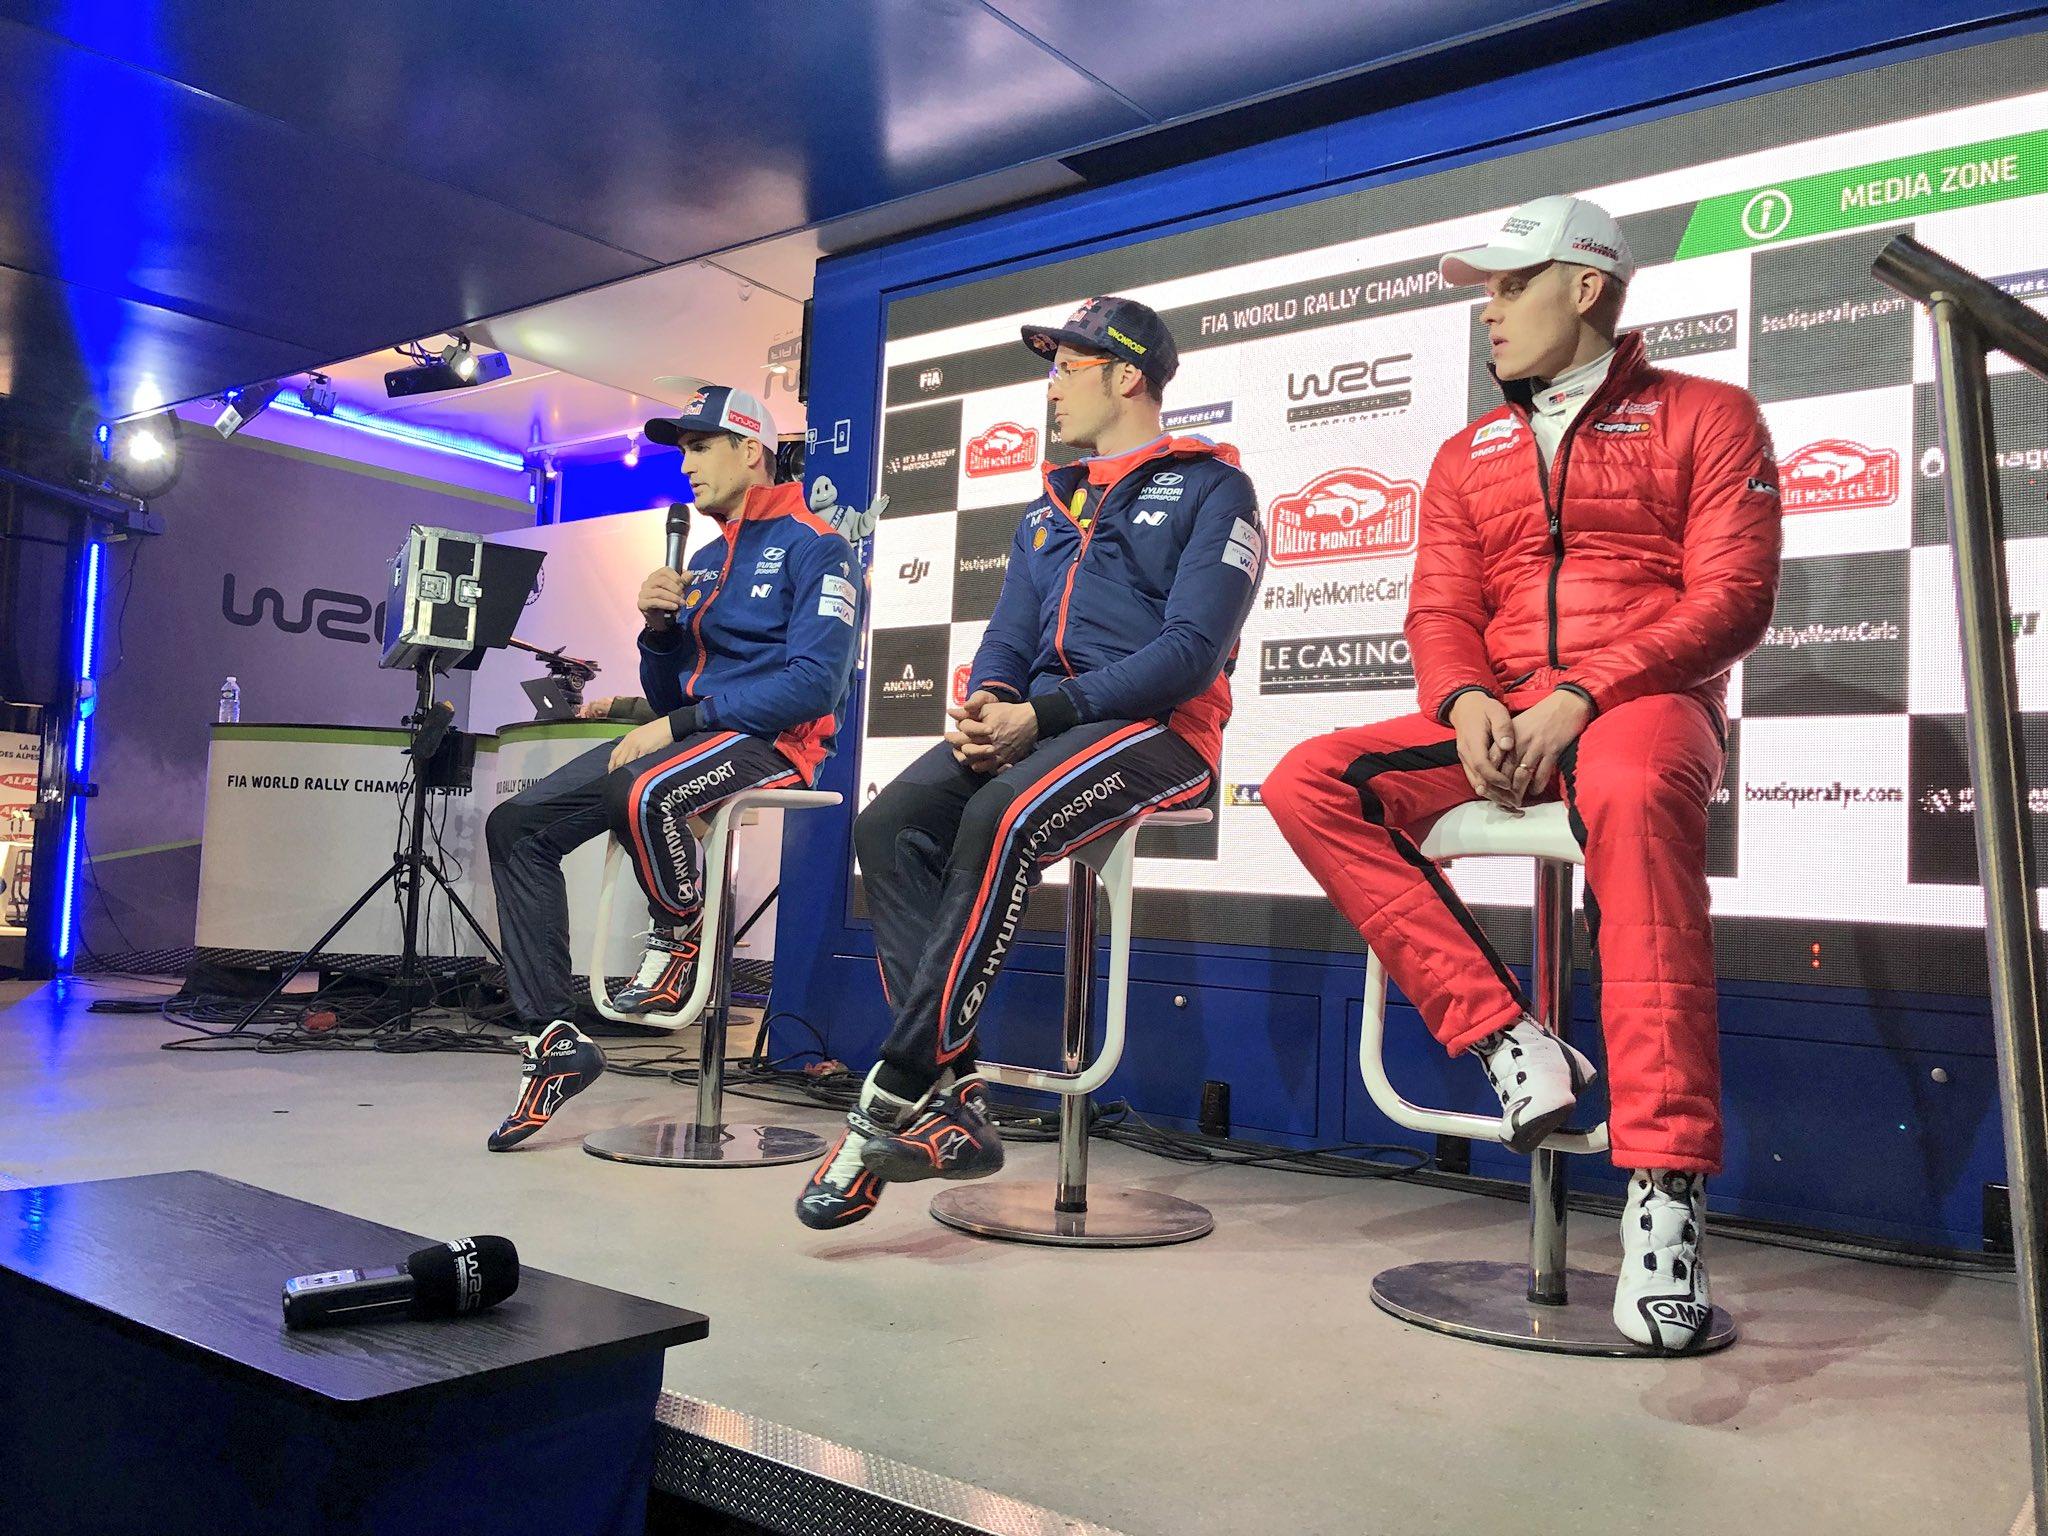 Rally Montecarlo 2018 - Página 2 DUUw3dHW0AIHOBx